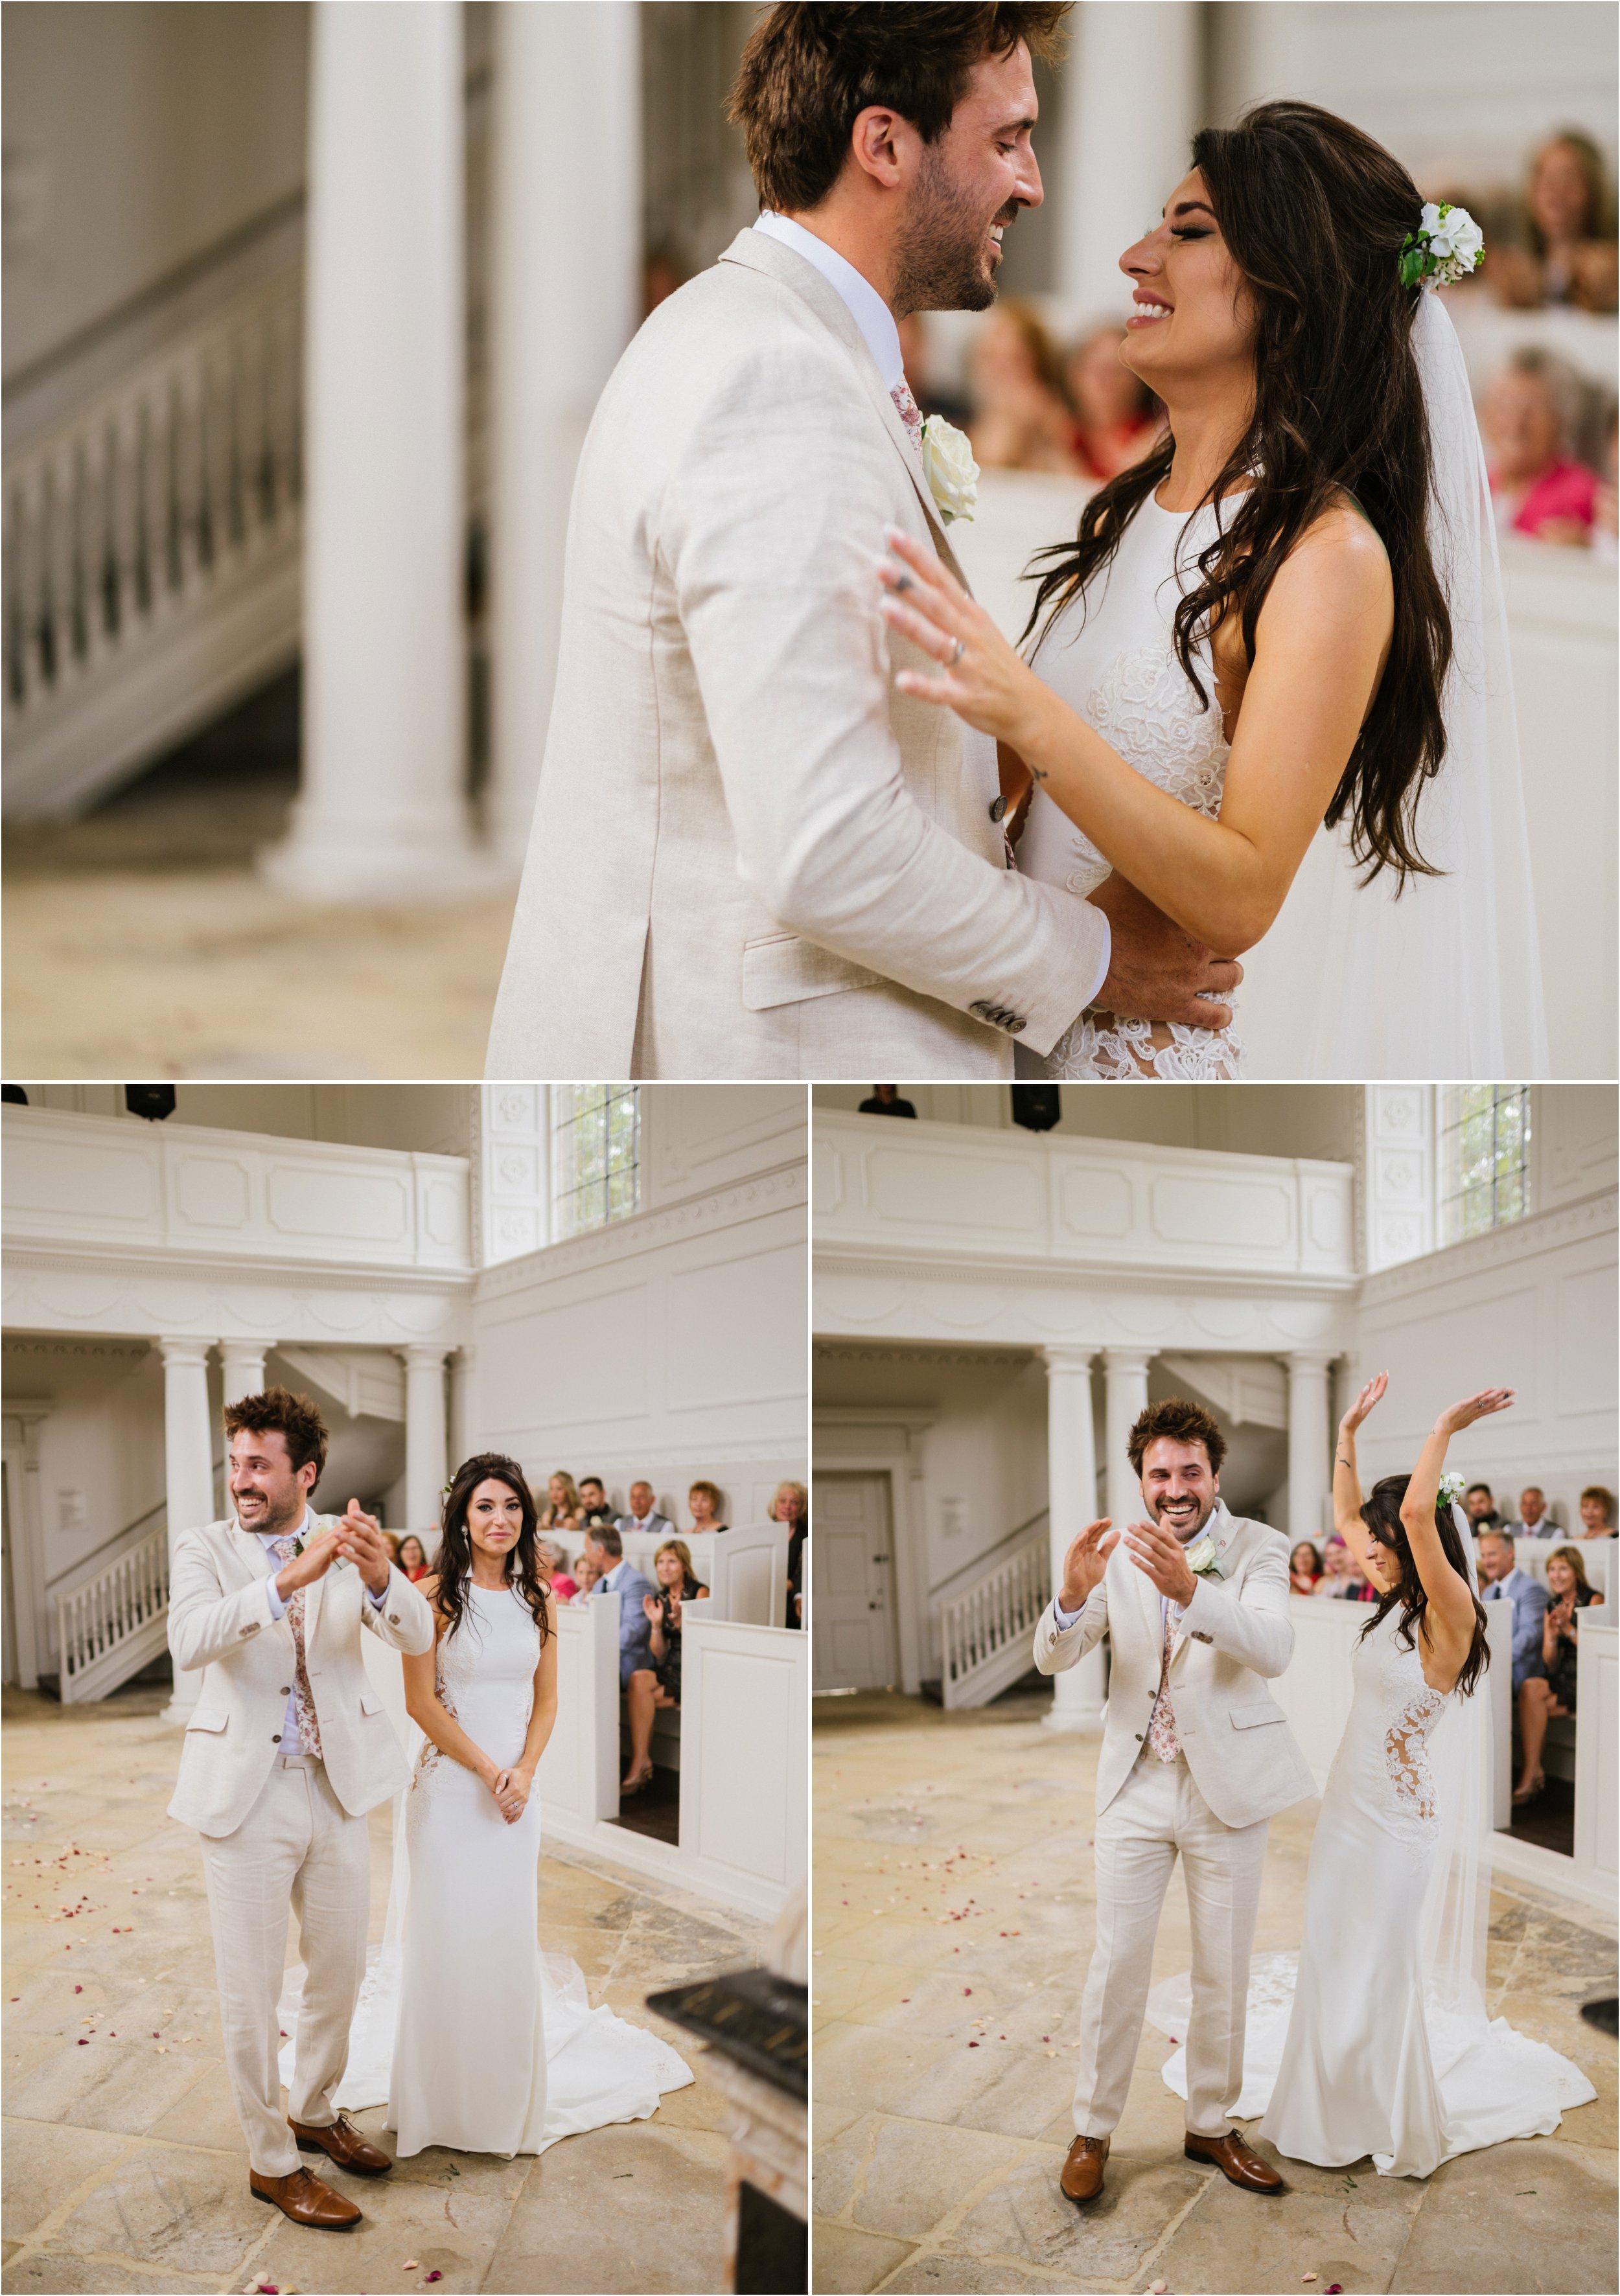 Compton Verney wedding photography_0064.jpg